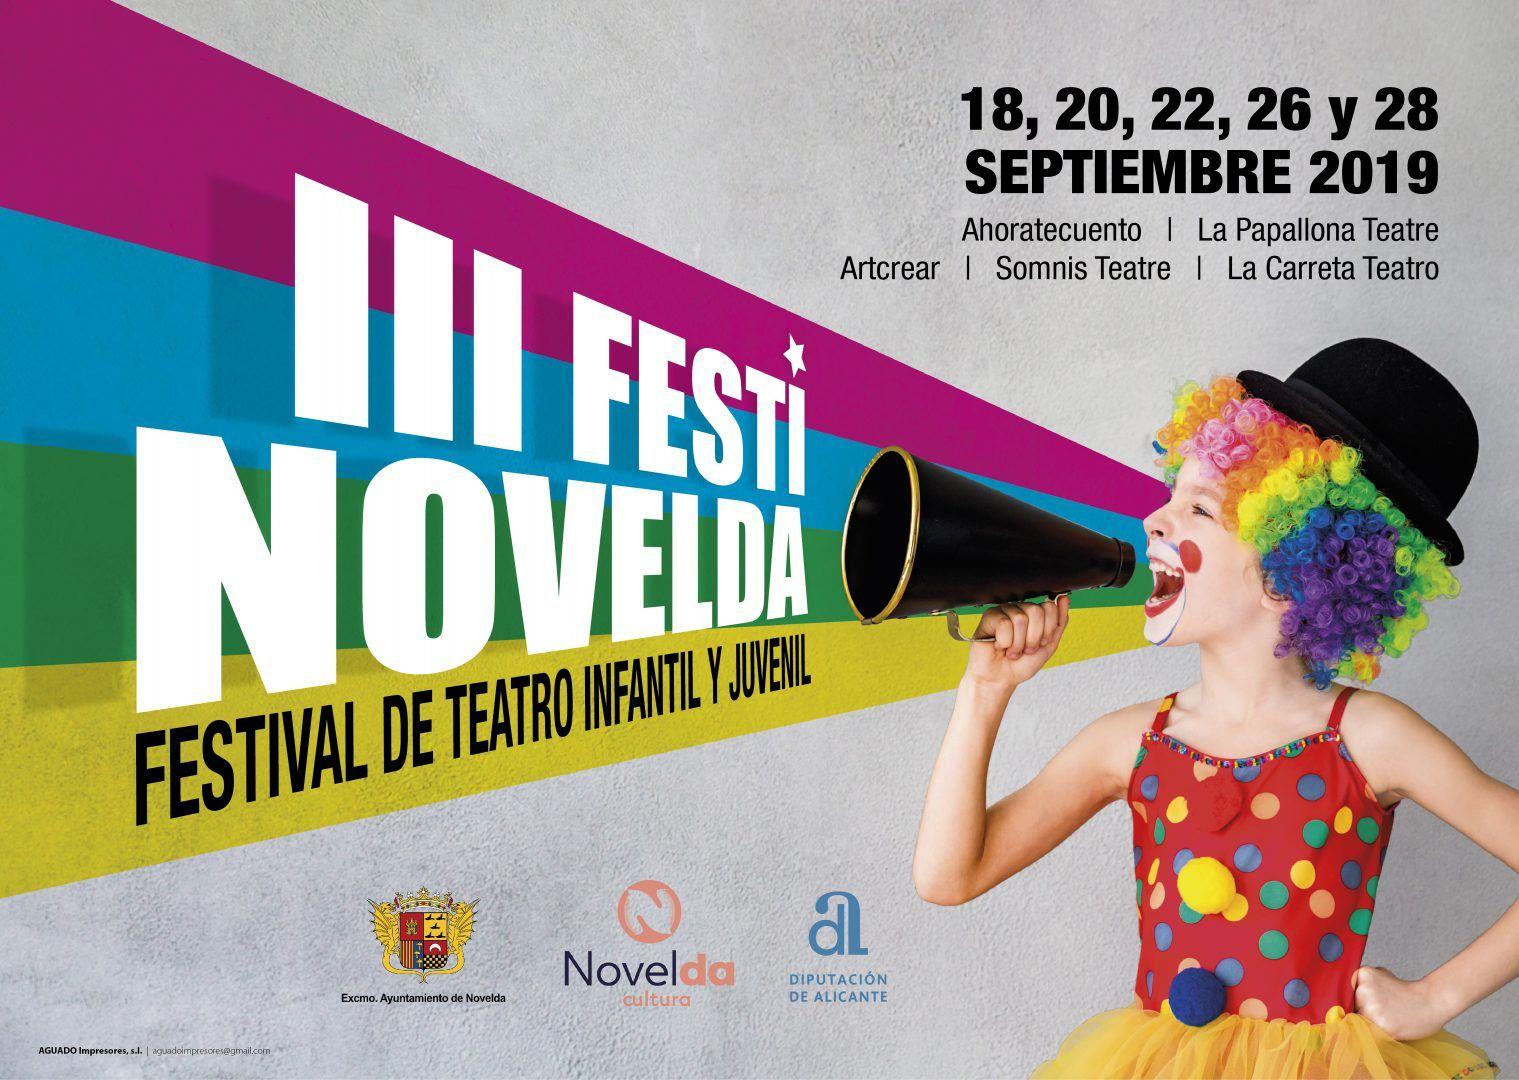 Ayuntamiento de Novelda cartel-IIIFestinovelda-2019-01-2 III Festinovelda